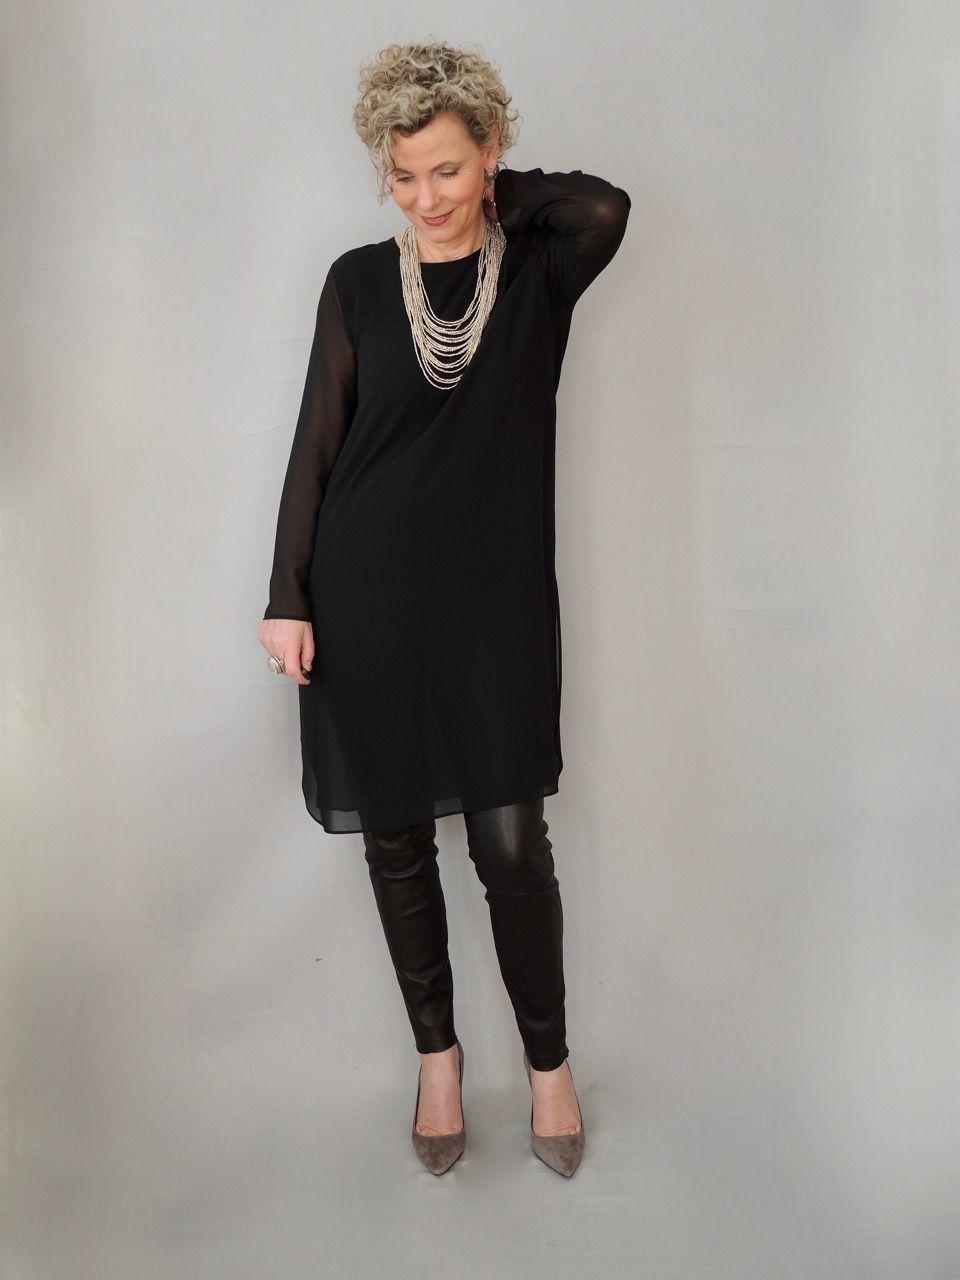 http://women2style.de/allgemein/happy-new-year-2/ | Style ...